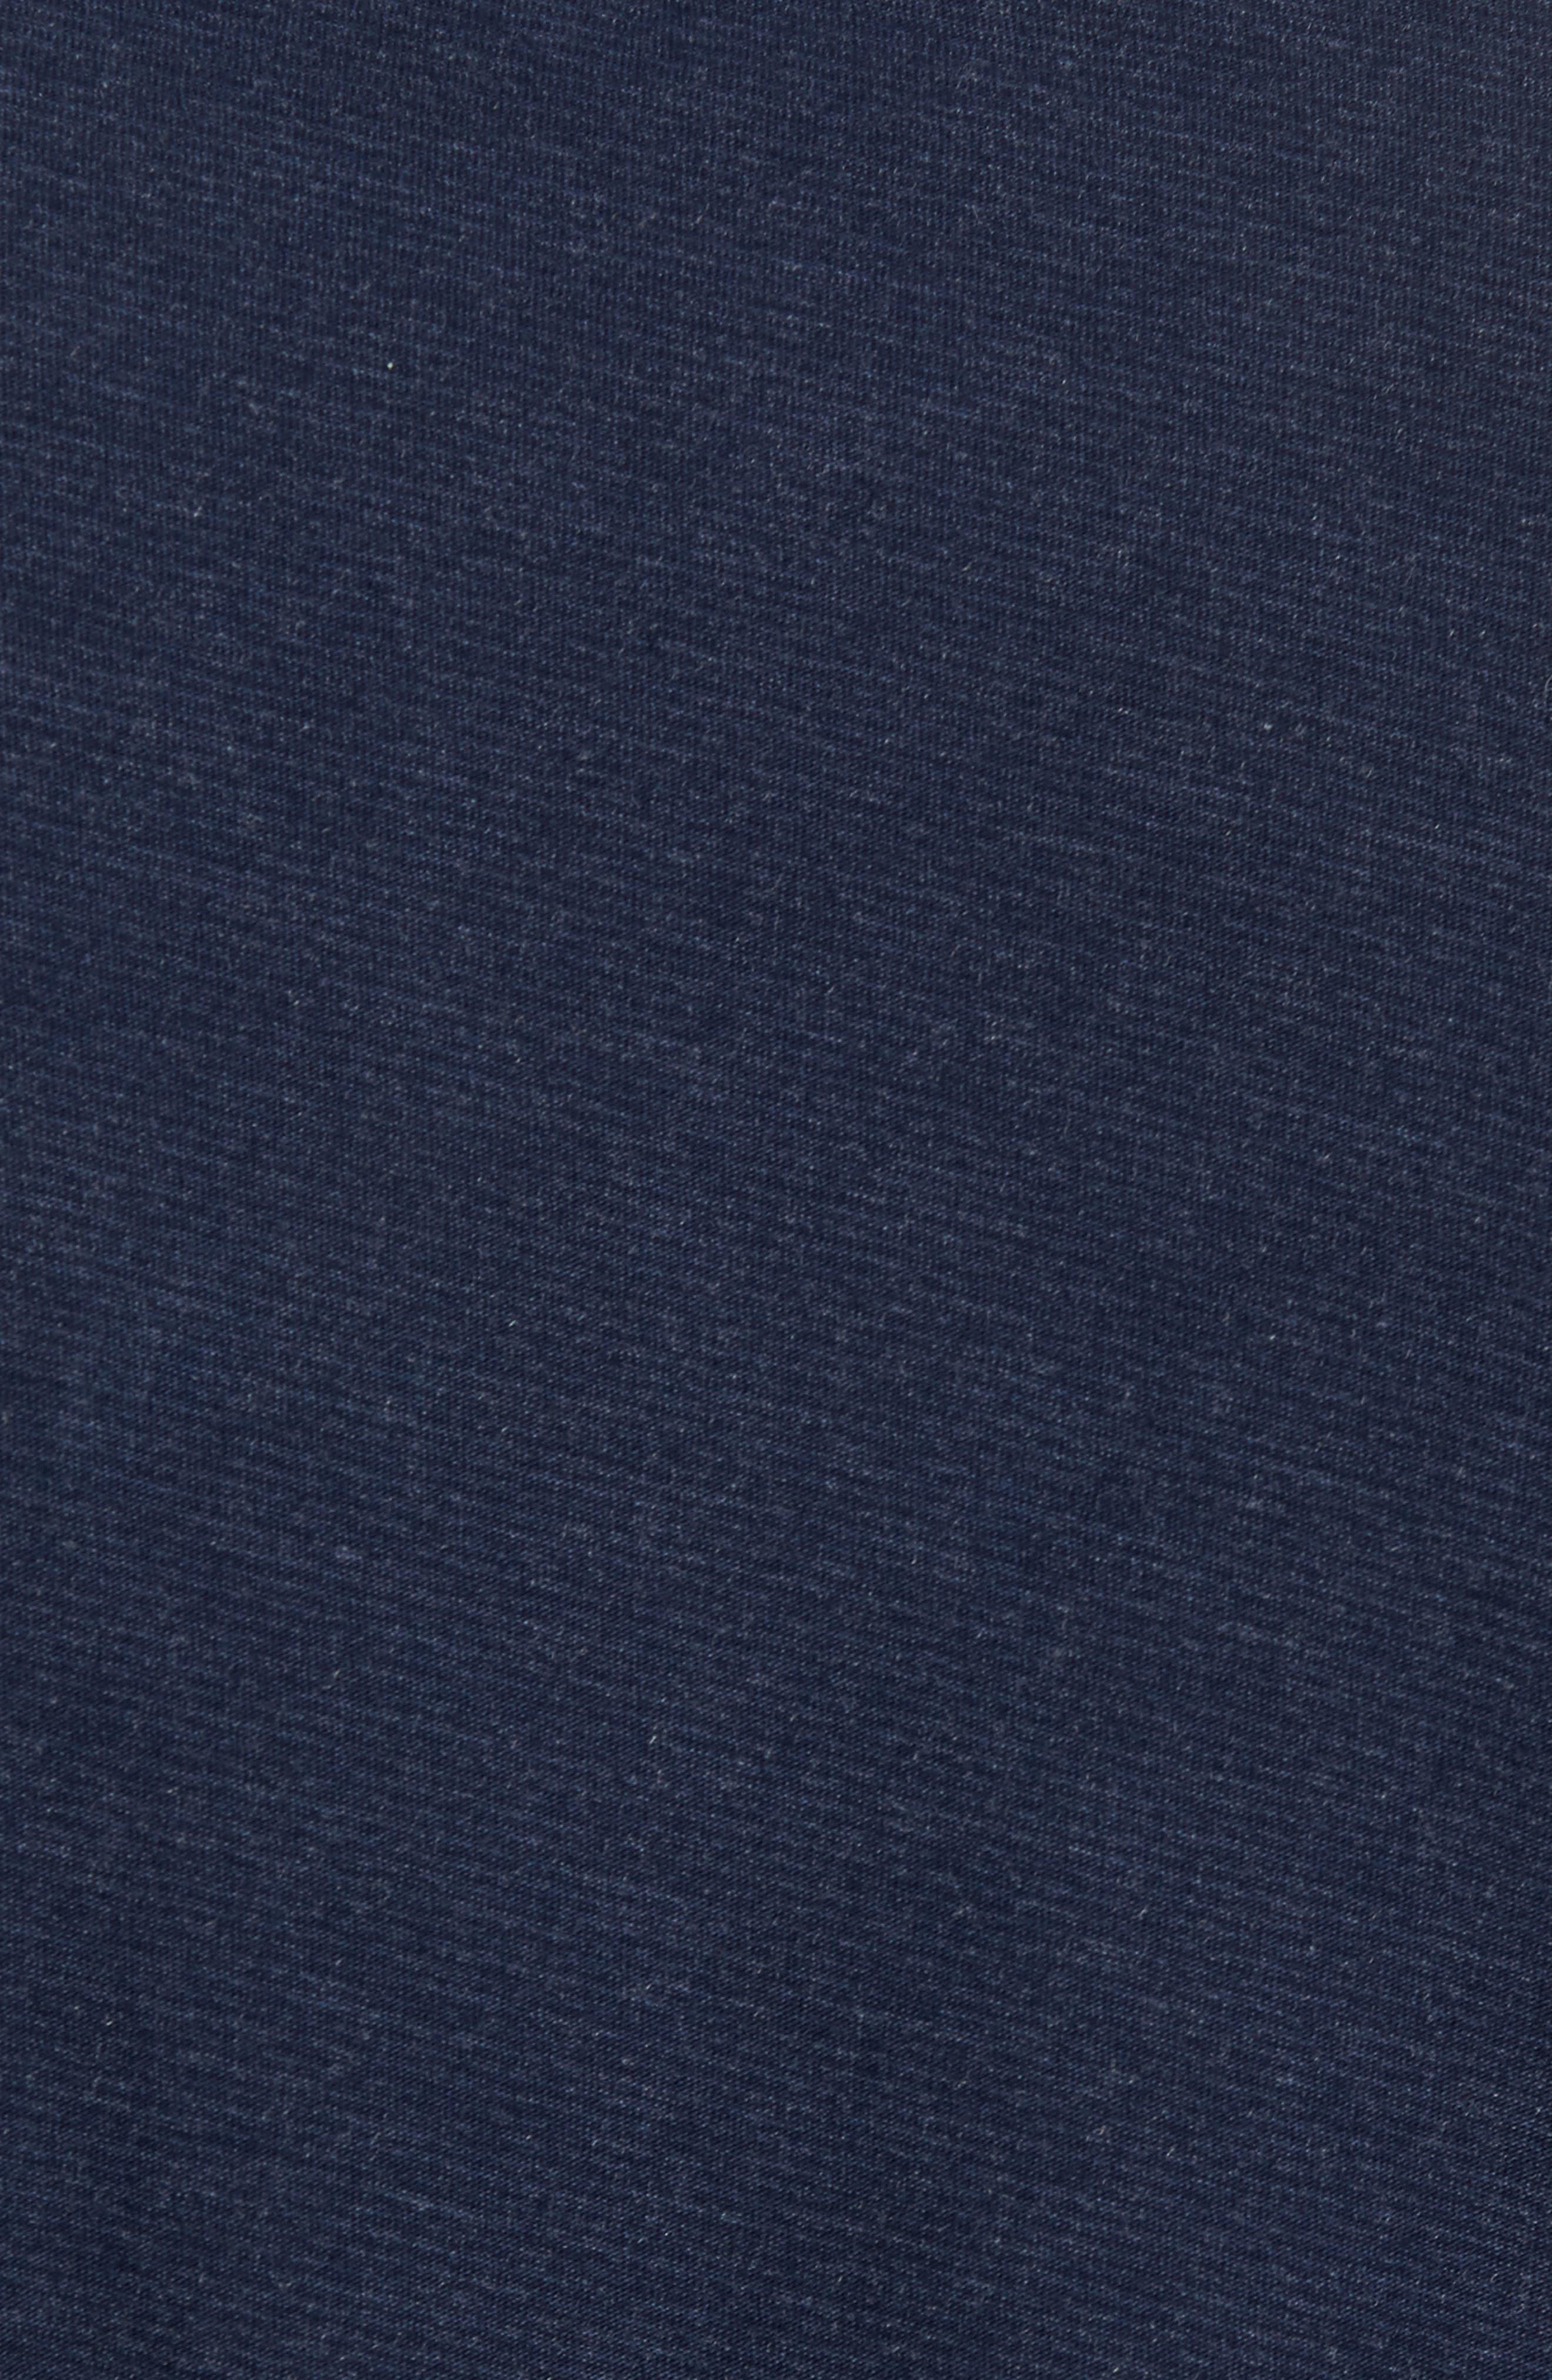 Drake Crewneck Shirt,                             Alternate thumbnail 5, color,                             411